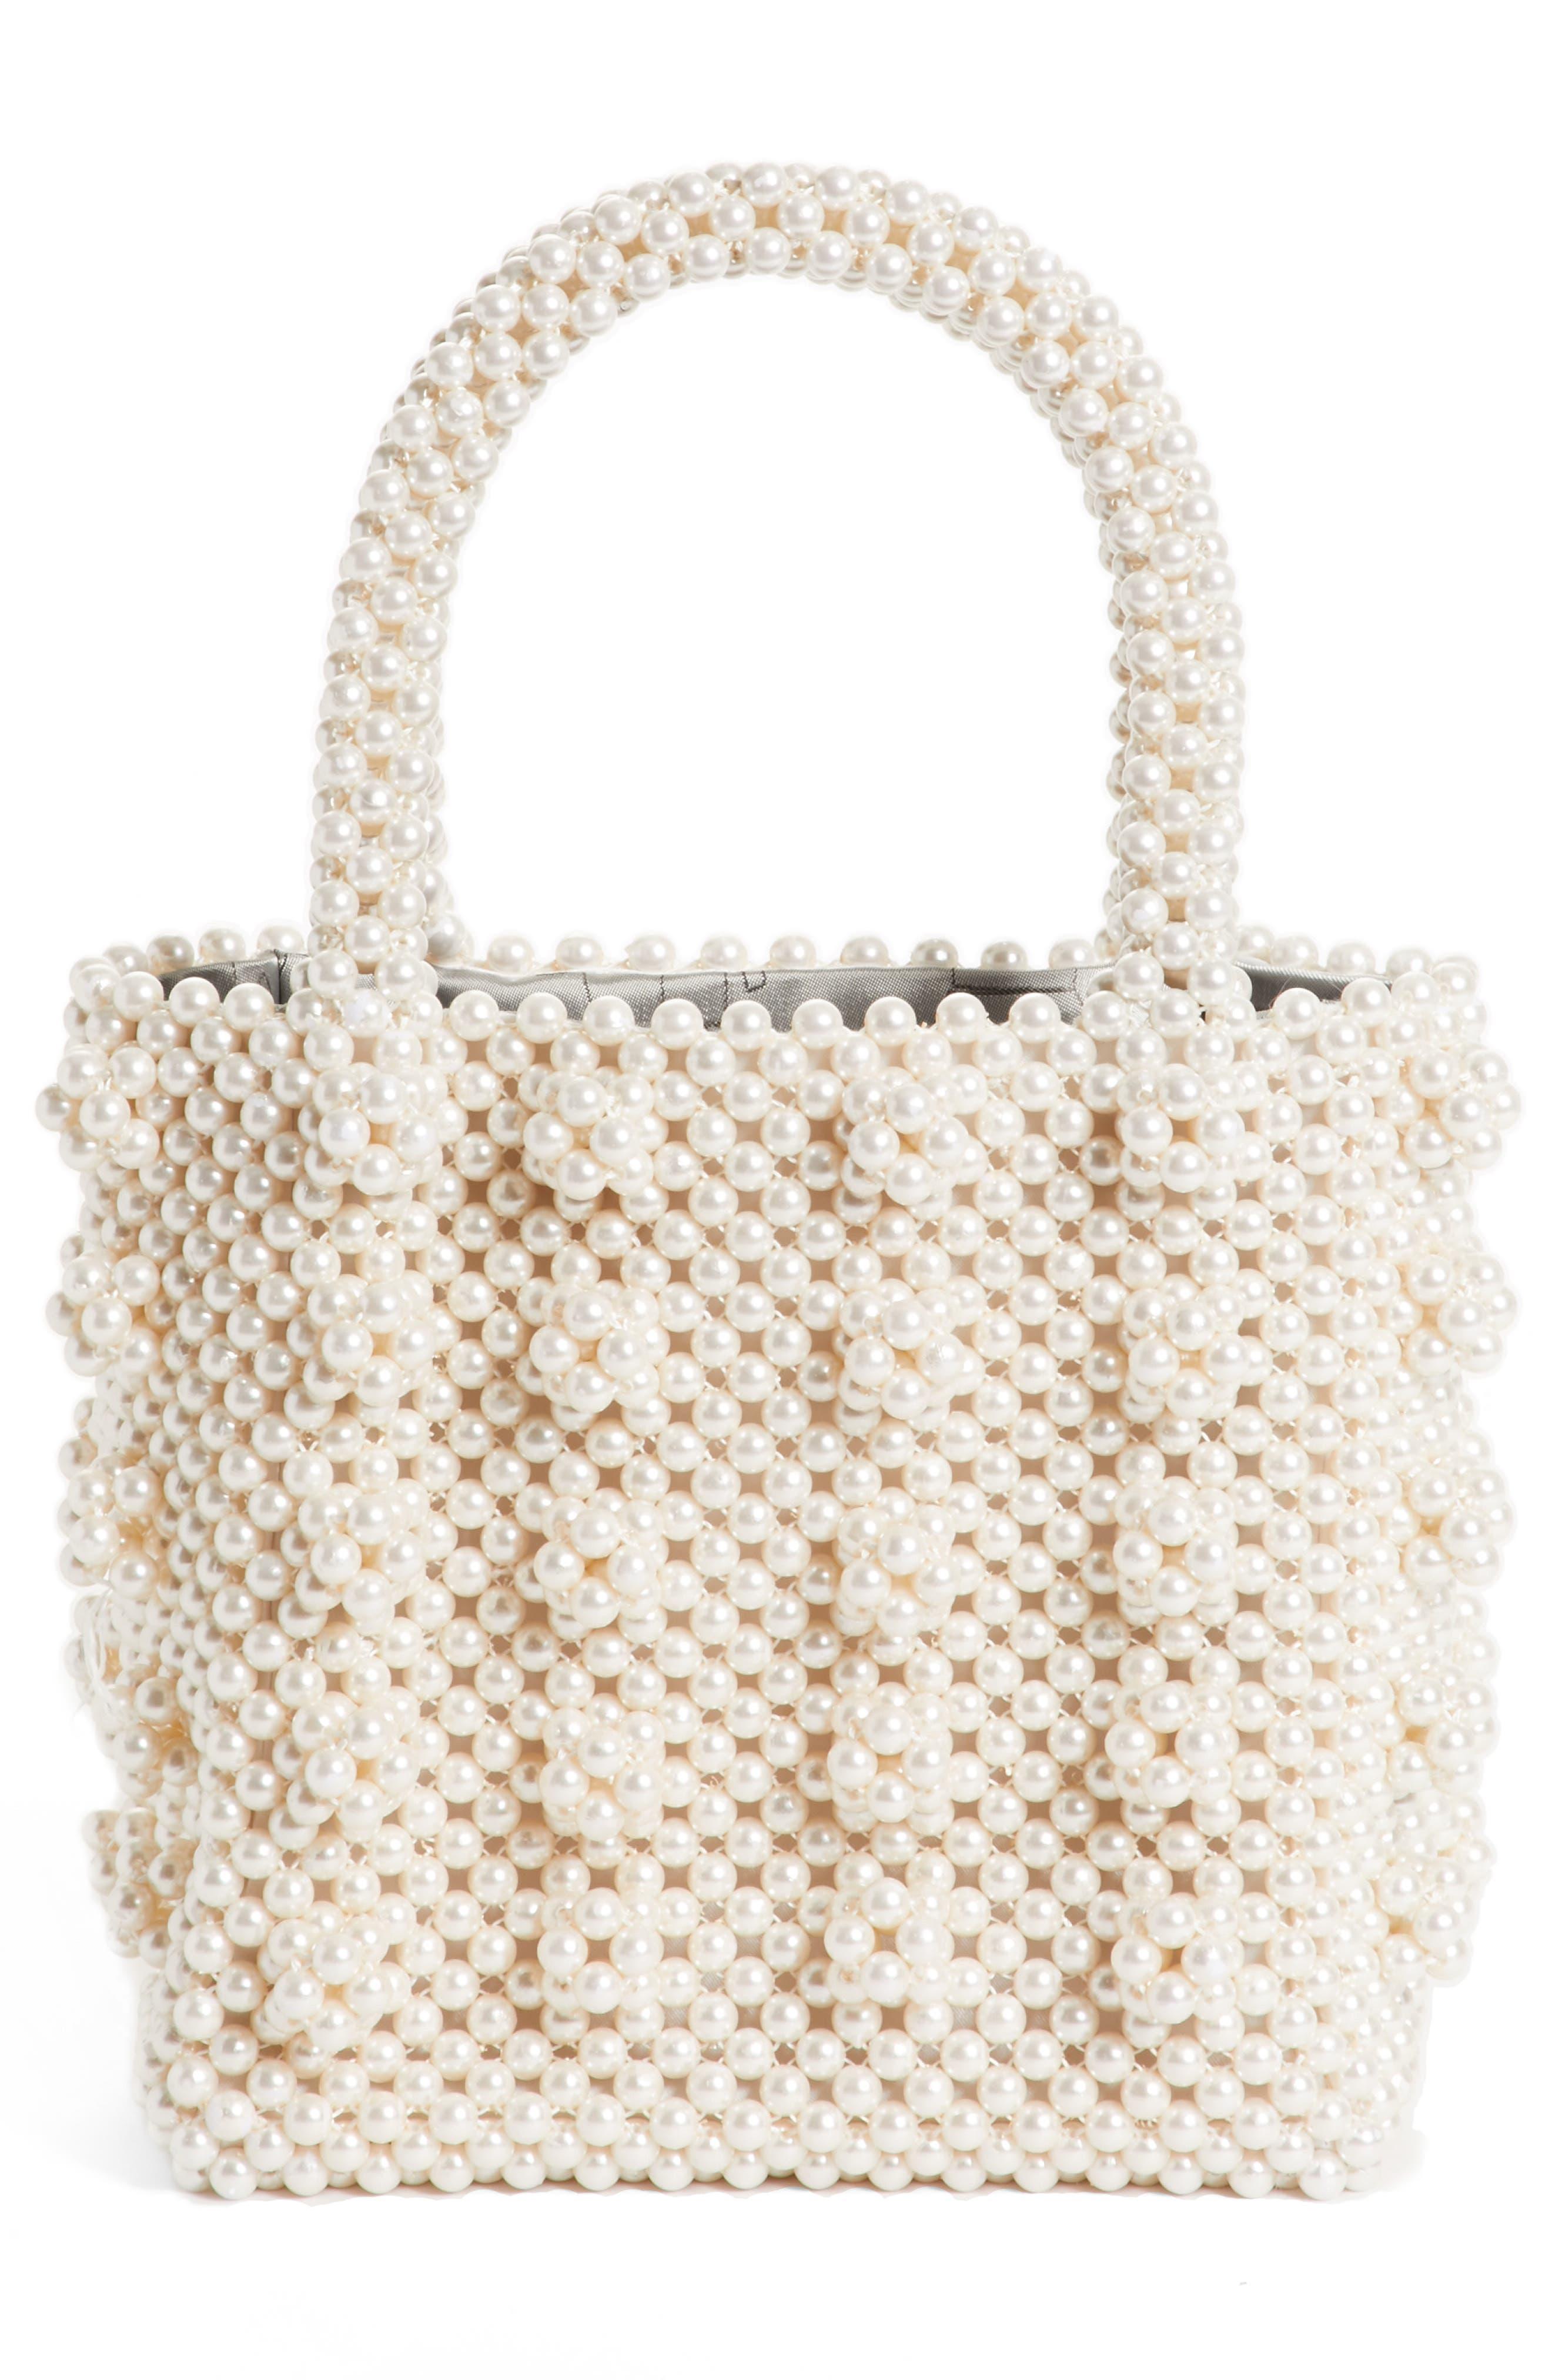 Antonia Small Imitation Pearl Beaded Handbag,                             Alternate thumbnail 3, color,                             Cream